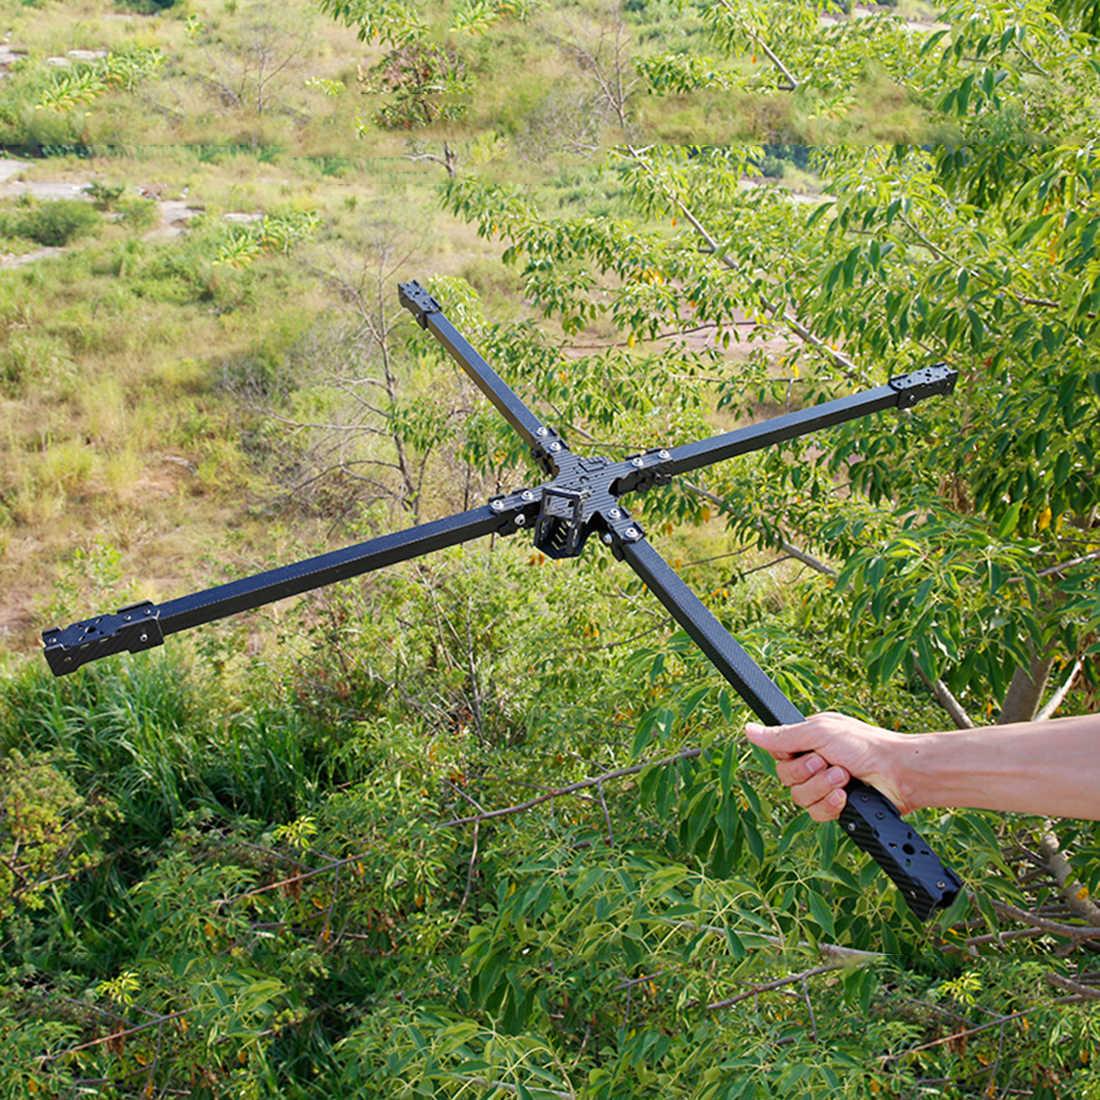 IFlight iXC15 X-CLASS 15 inç 950mm gerçek X 3K karbon Fiber çerçeve kiti uyumlu Tachyon X4114 660KV Motor FPV Drone